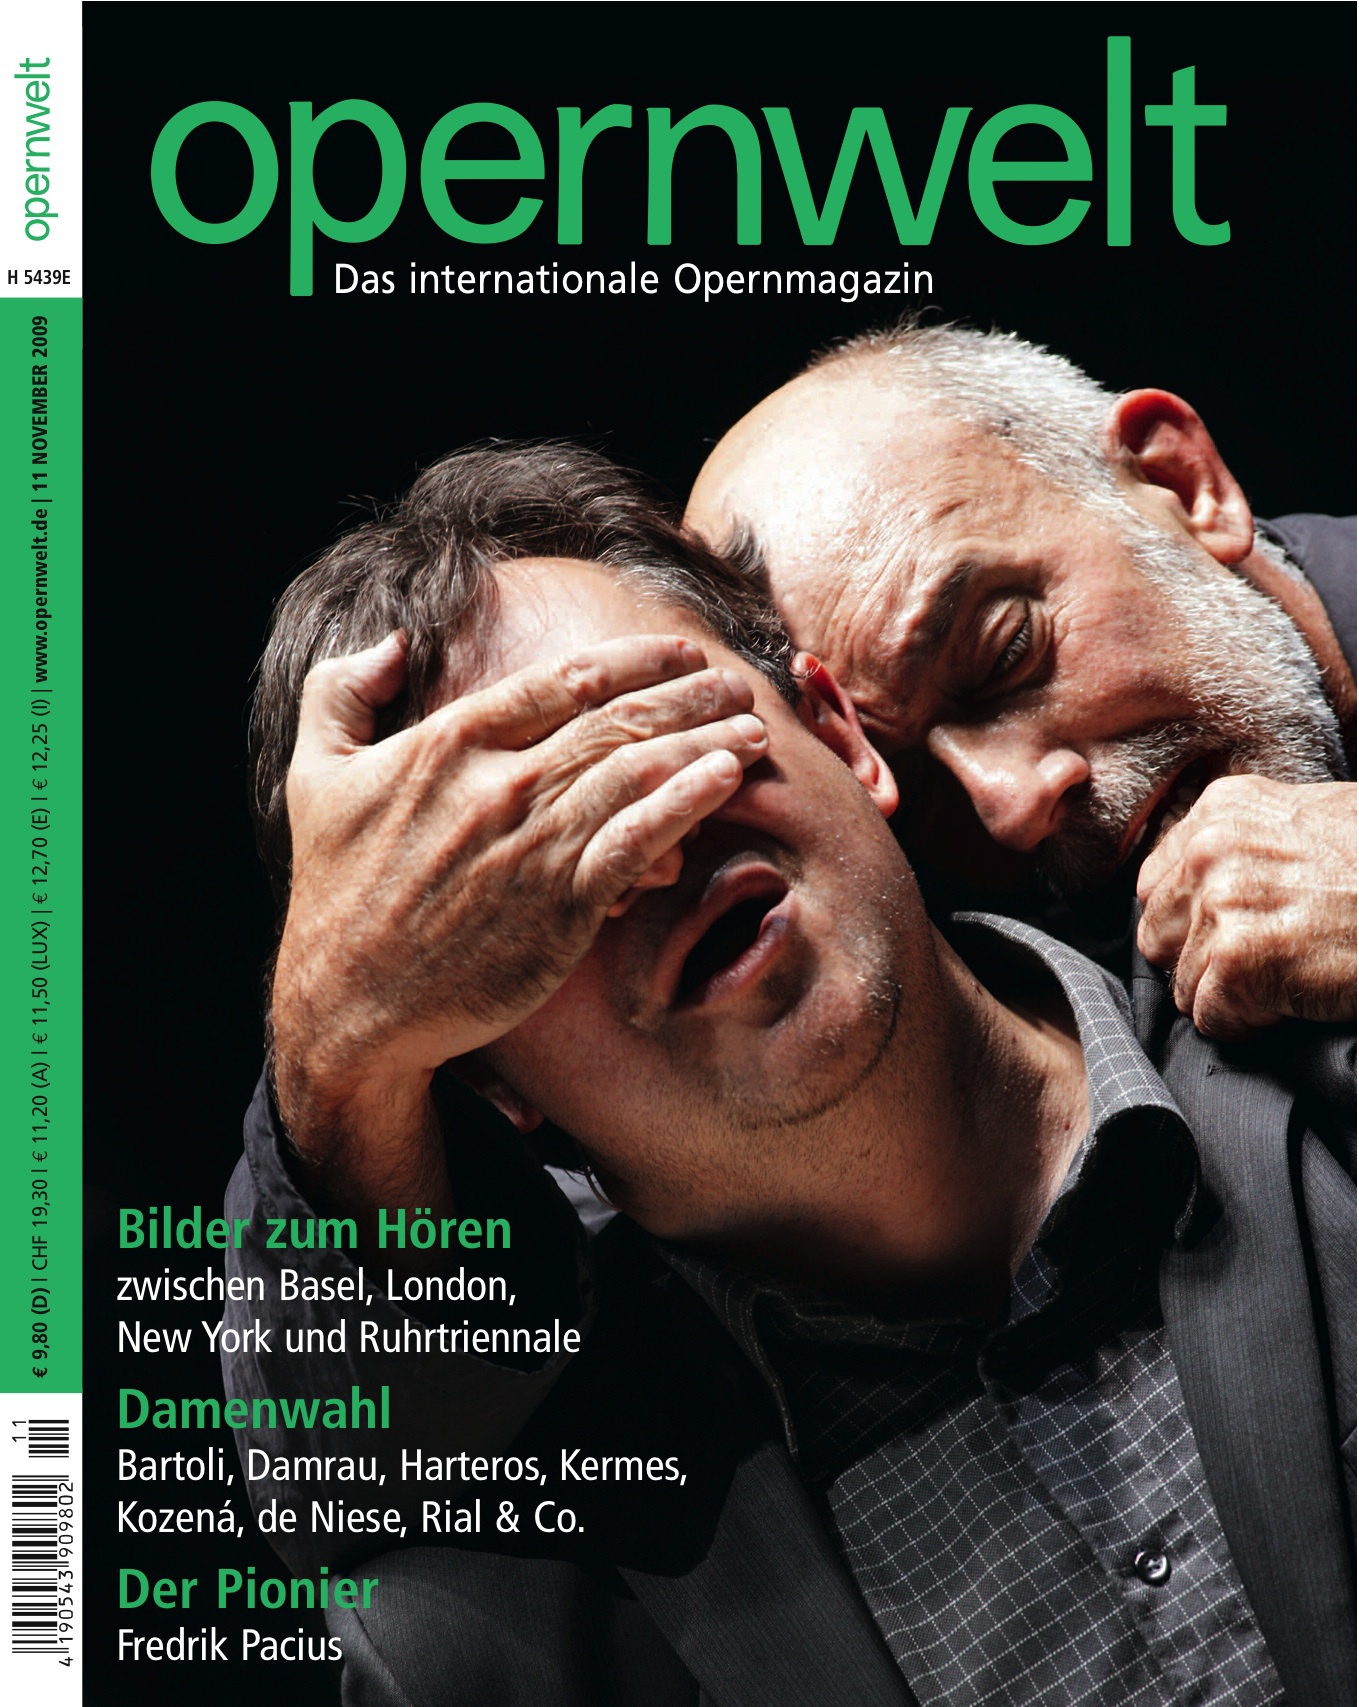 Opernwelt November (11/2009)